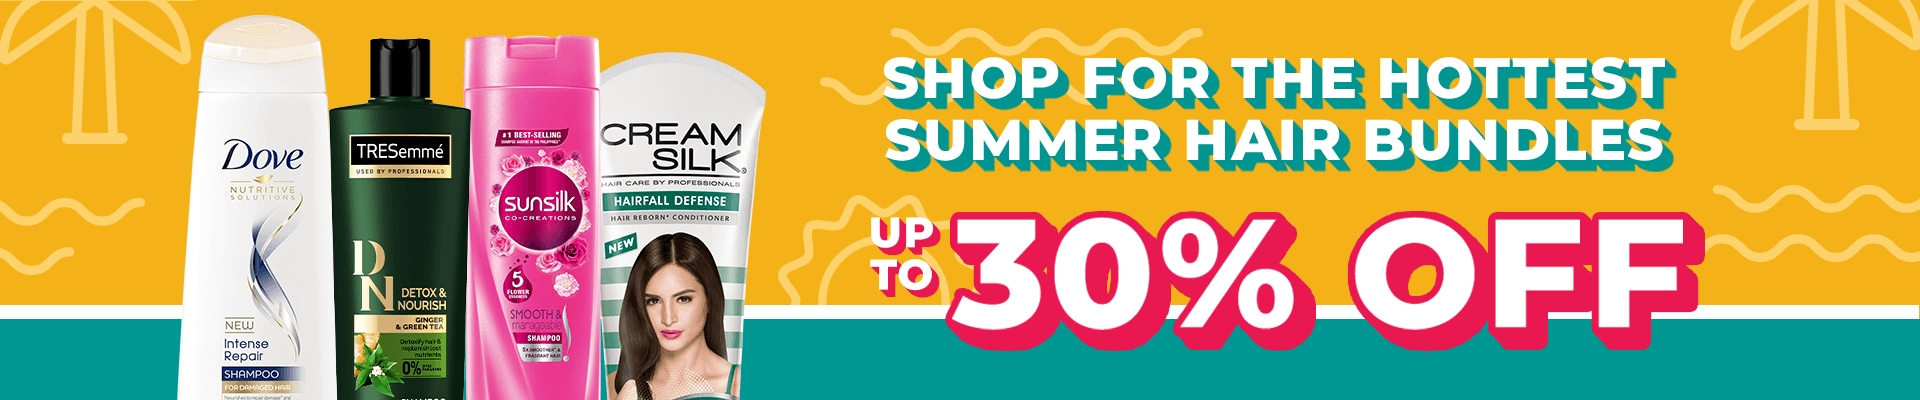 All Things Hair Summer Sale Banner